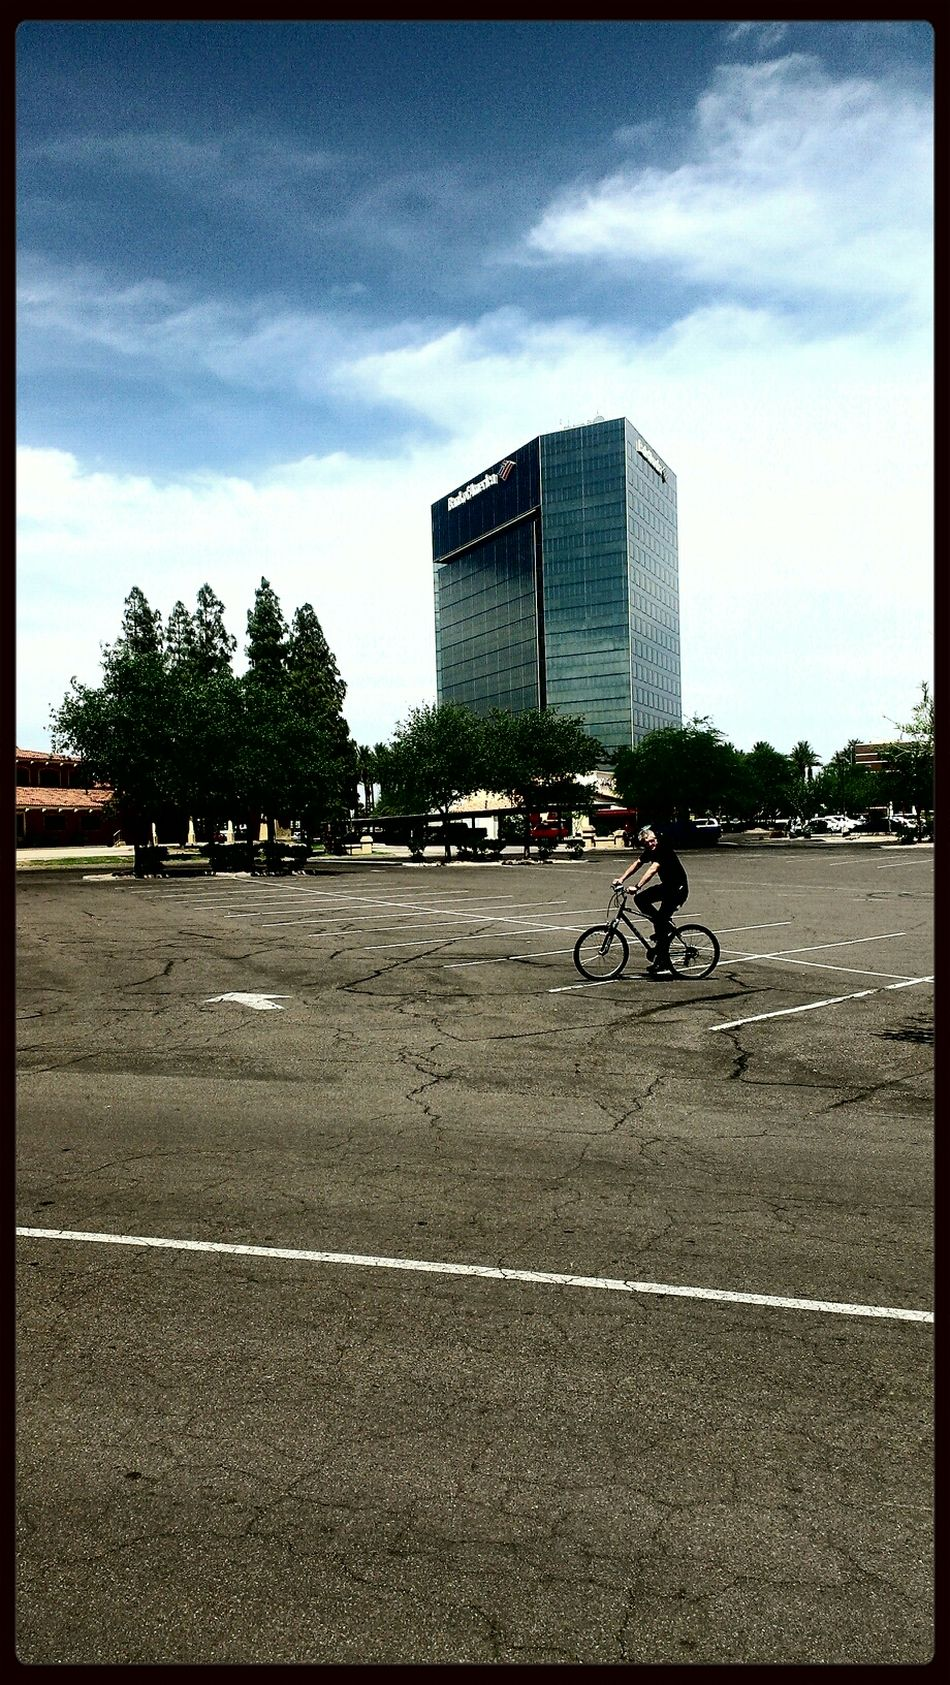 Urban Buildings Bank Of America Building